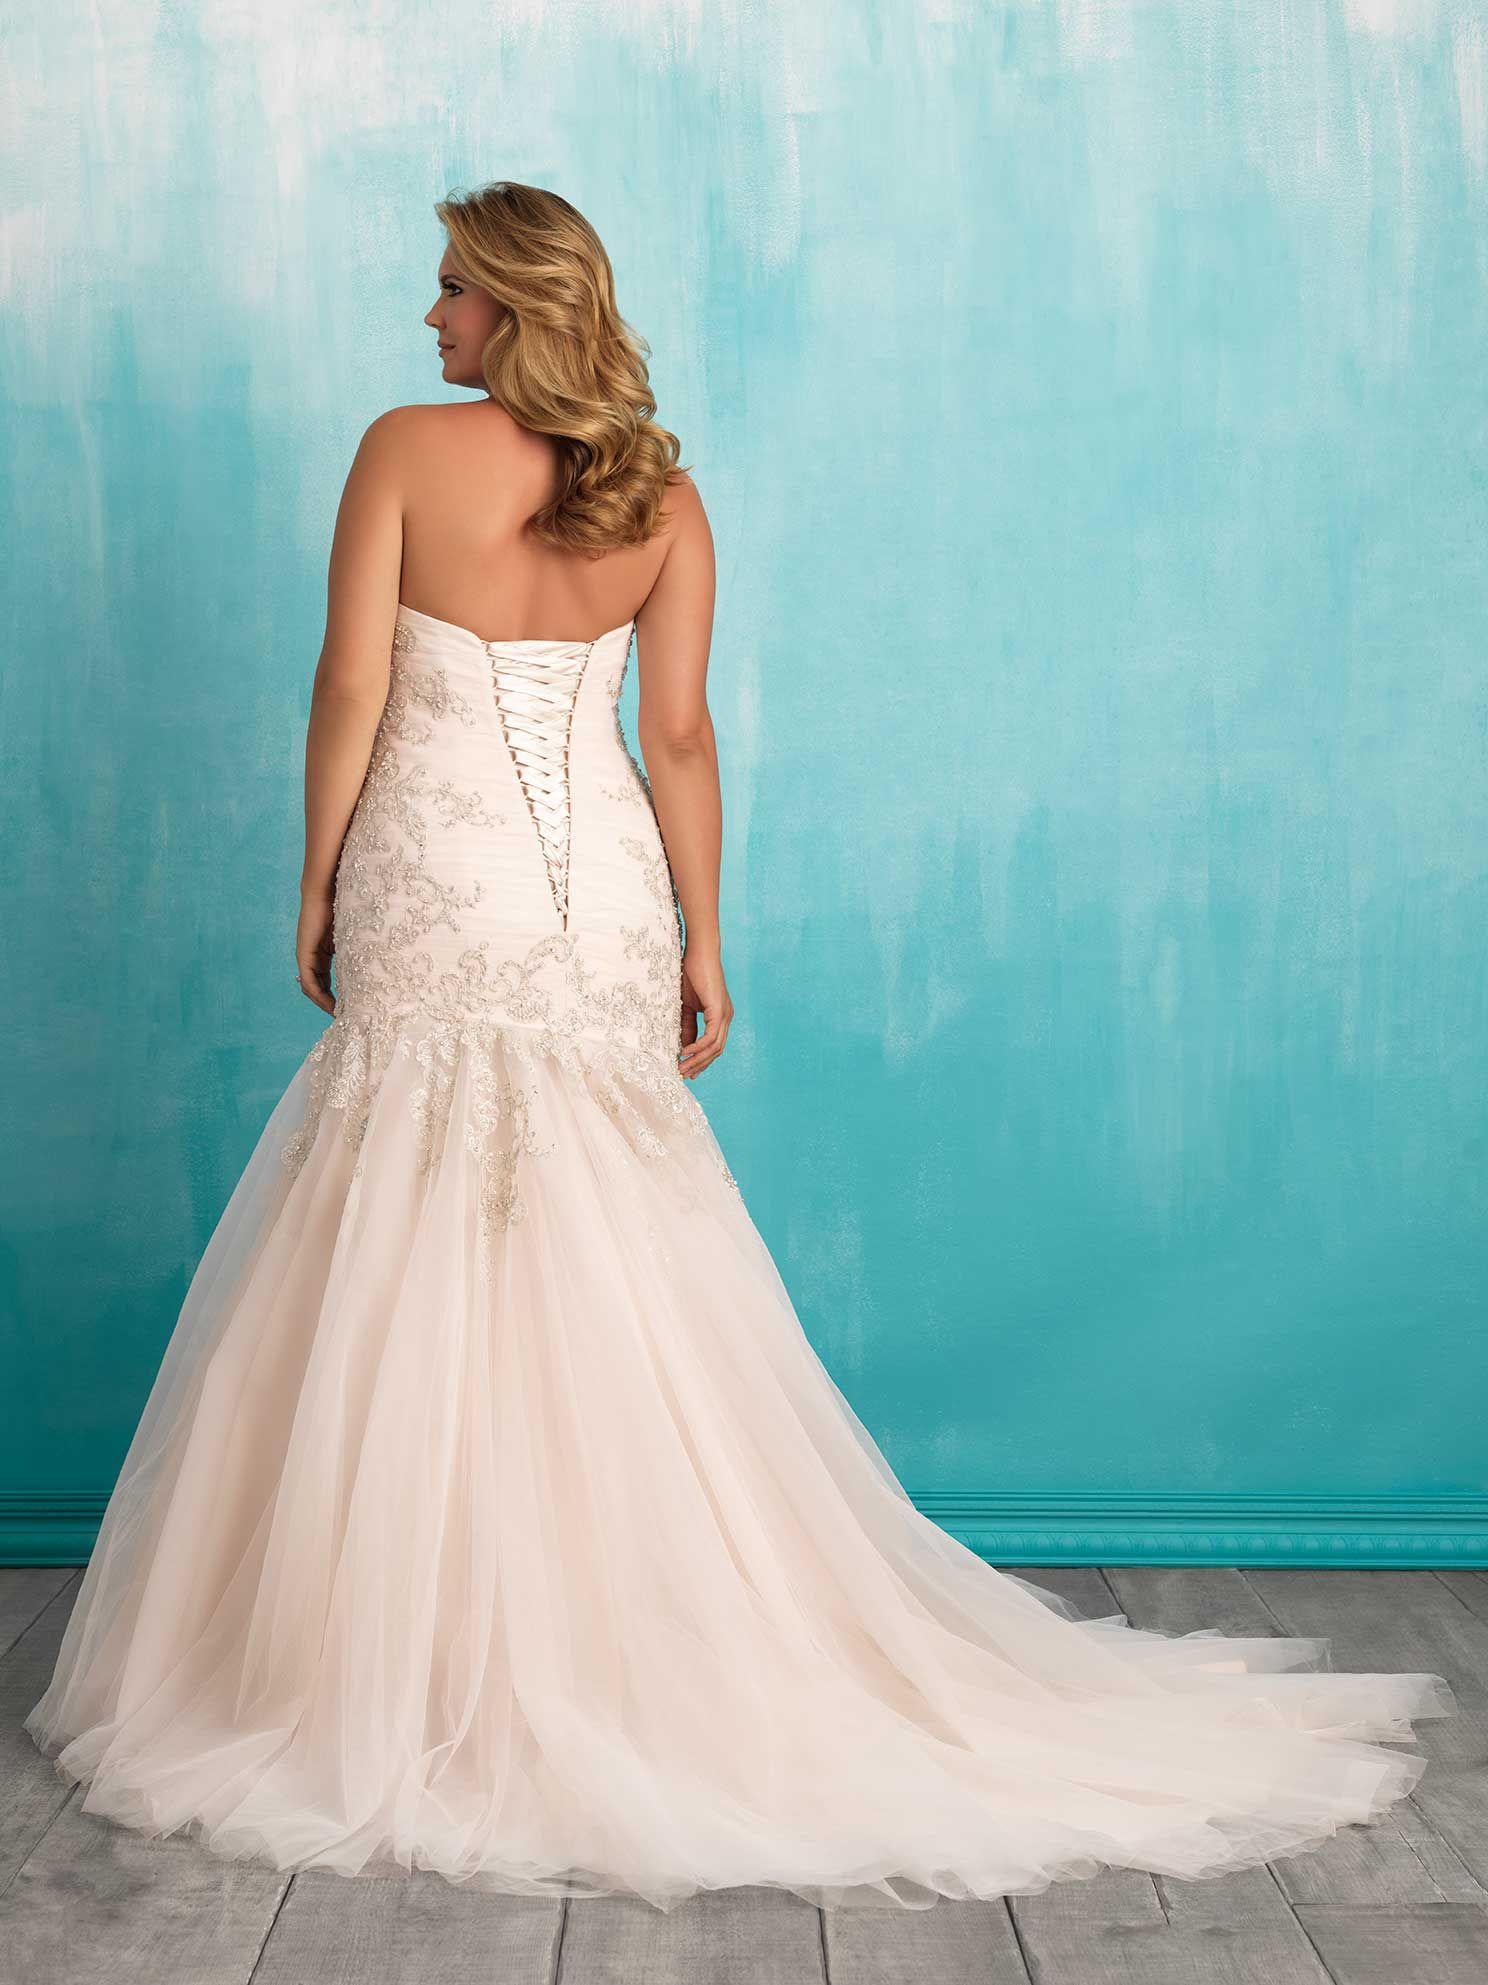 Style W372 Allure Bridal Wedding Dresses Blush Wedding Dresses [ 1985 x 1488 Pixel ]